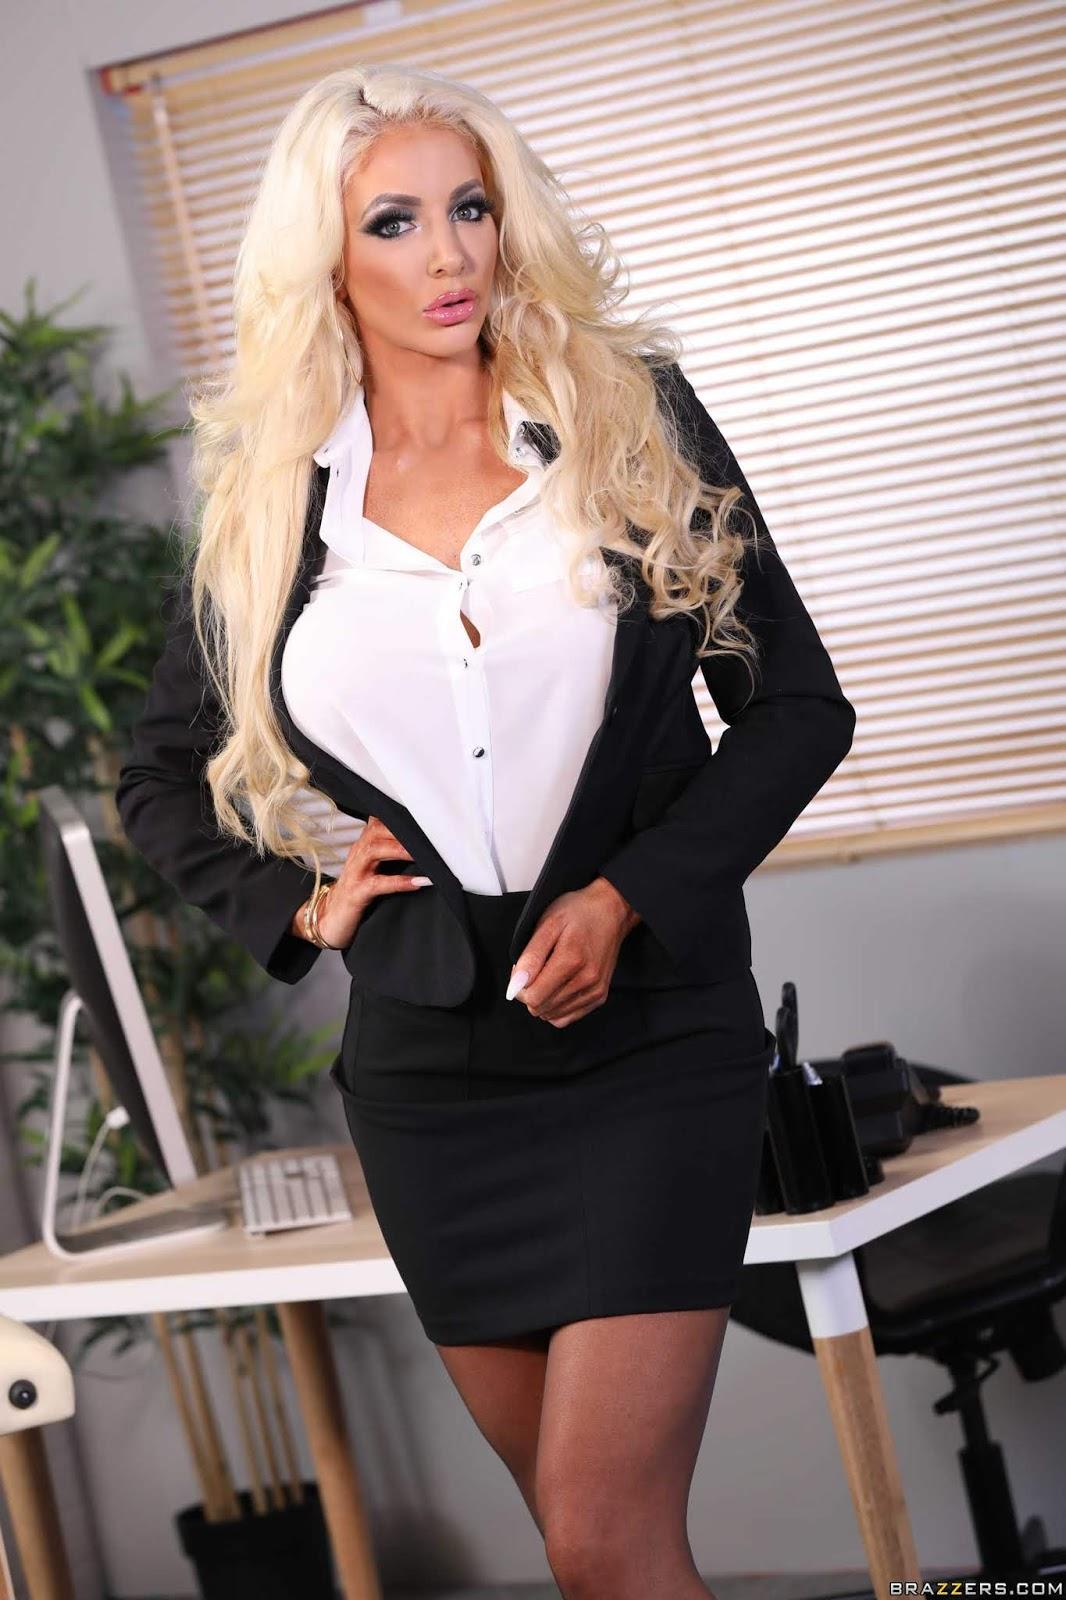 Nicolette-Shea-%3A-Massaged-On-The-Job-%23%23-BRAZZERS-r7aeft7qxk.jpg